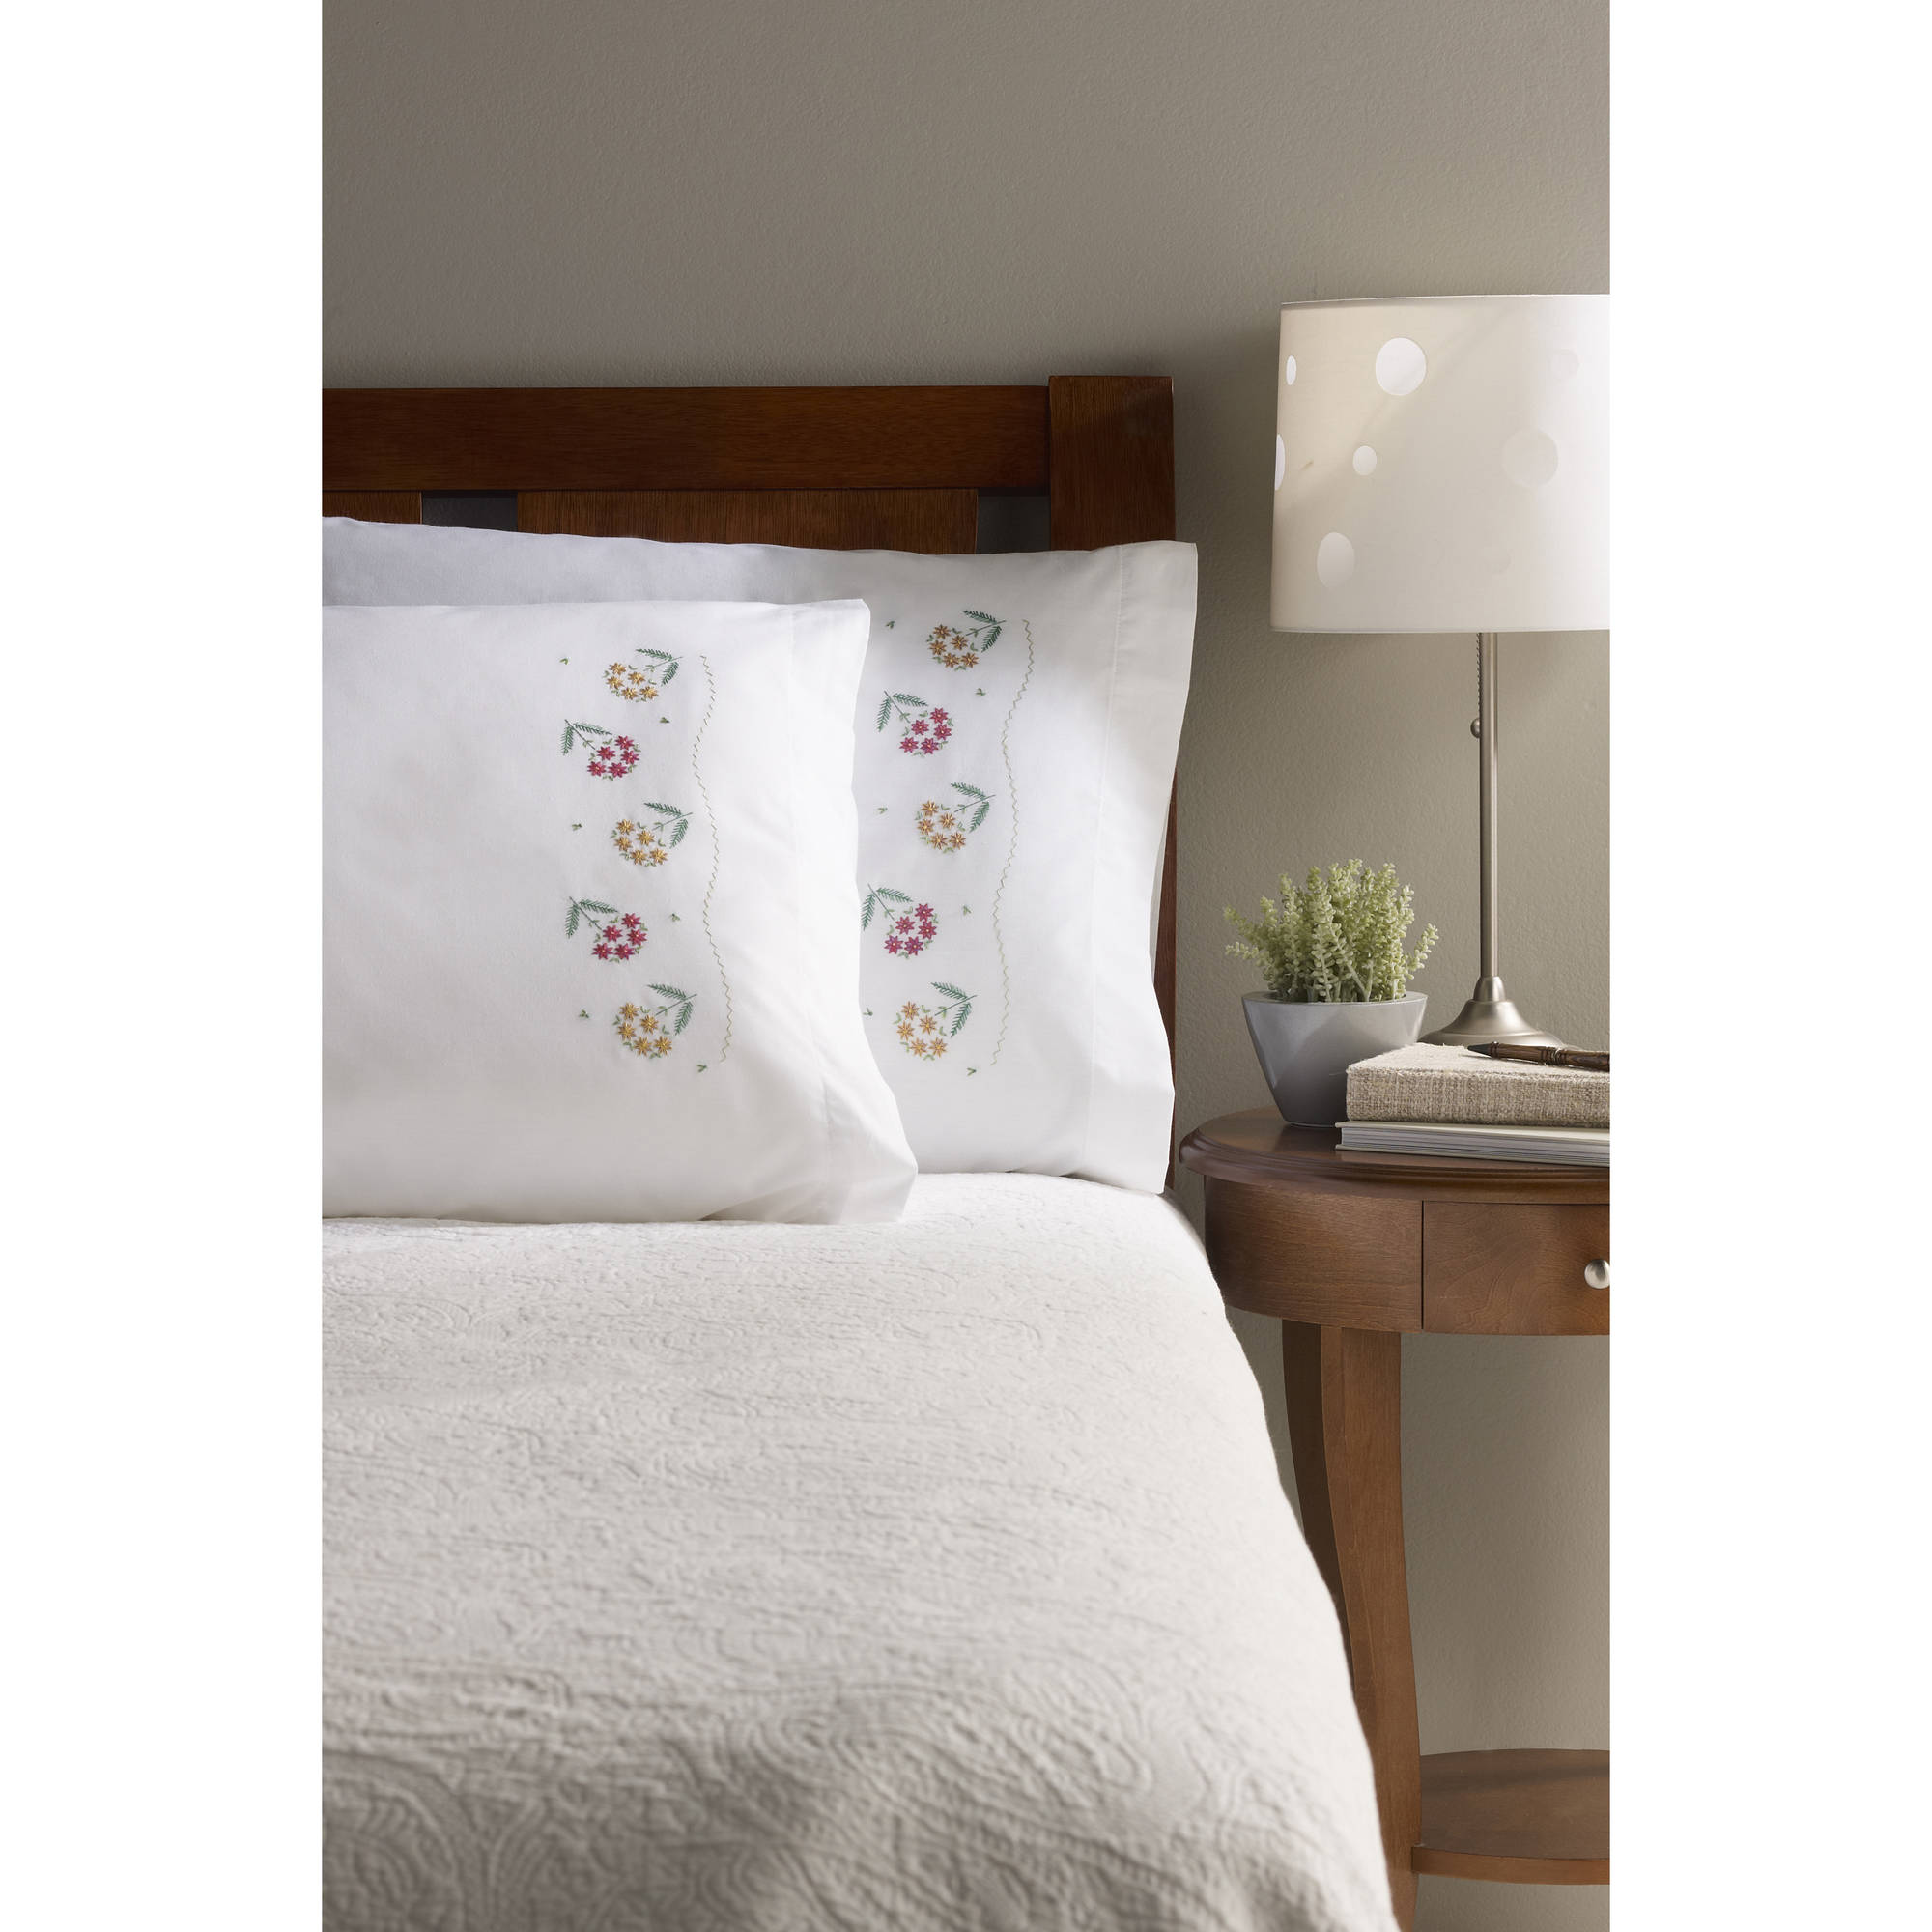 Bucilla Stamped Cross Stitch & Embroidery - Pillowcase Pairs